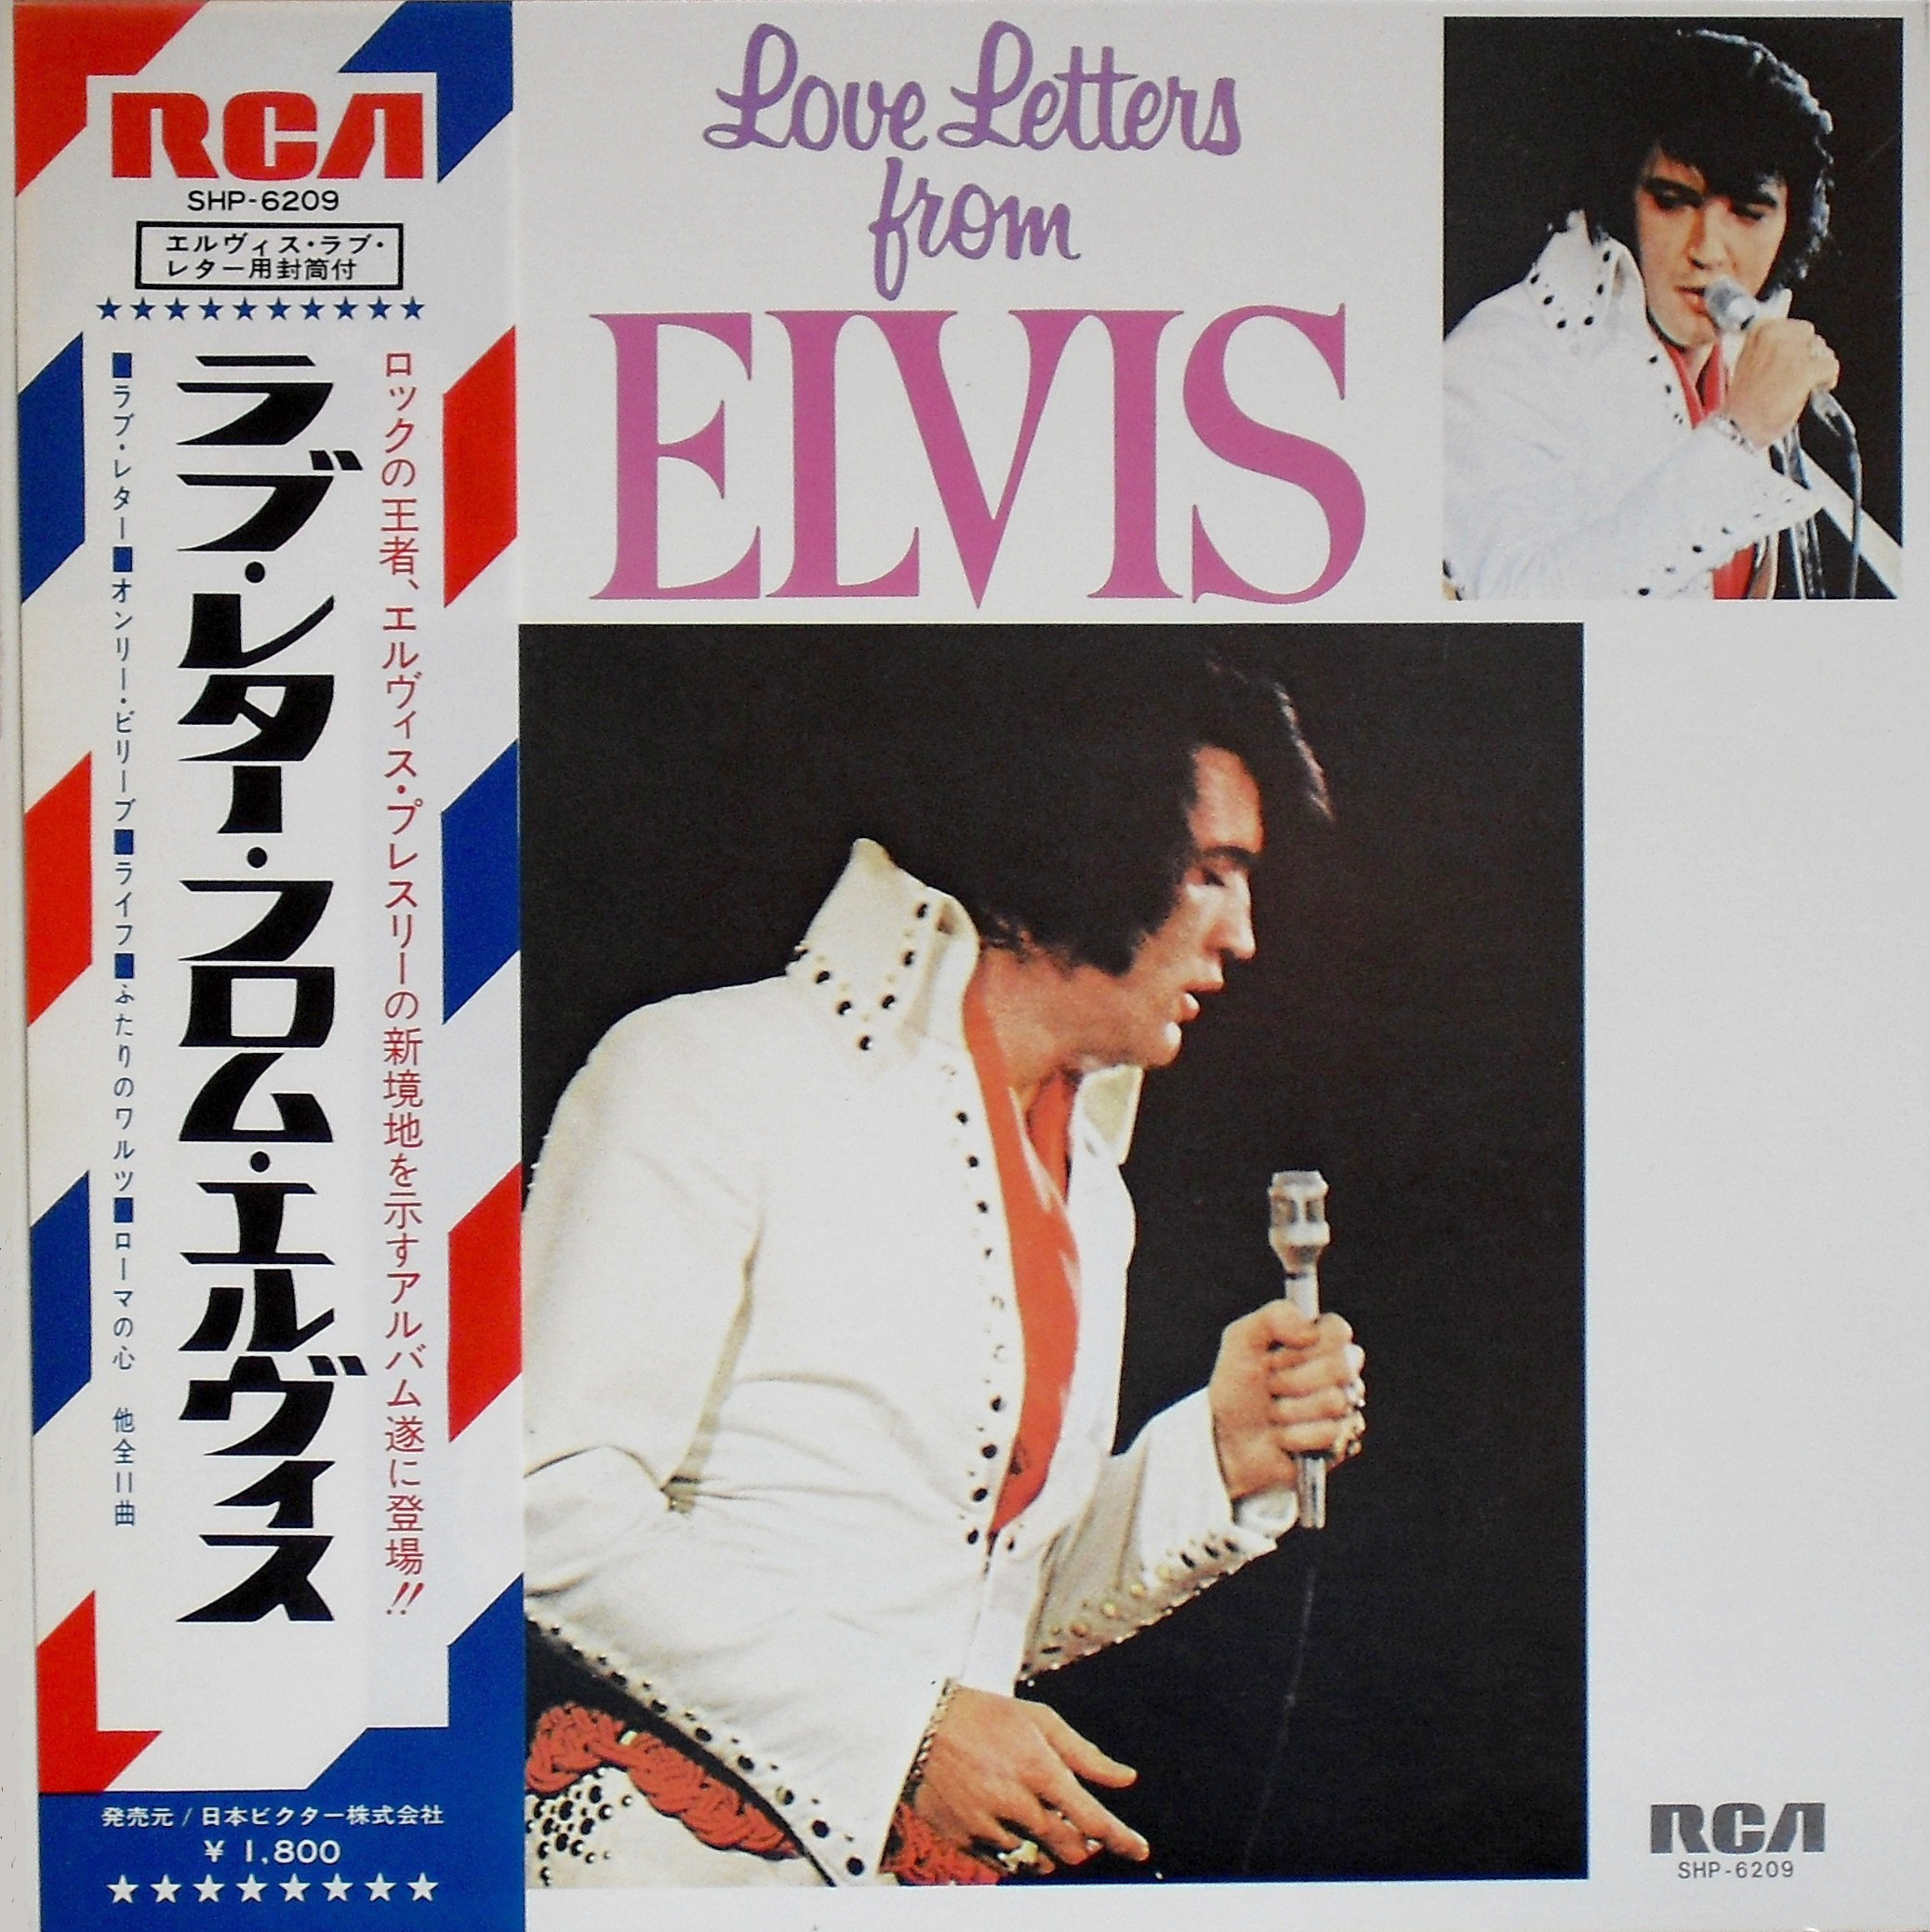 LOVE LETTERS FROM ELVIS 01njrjp